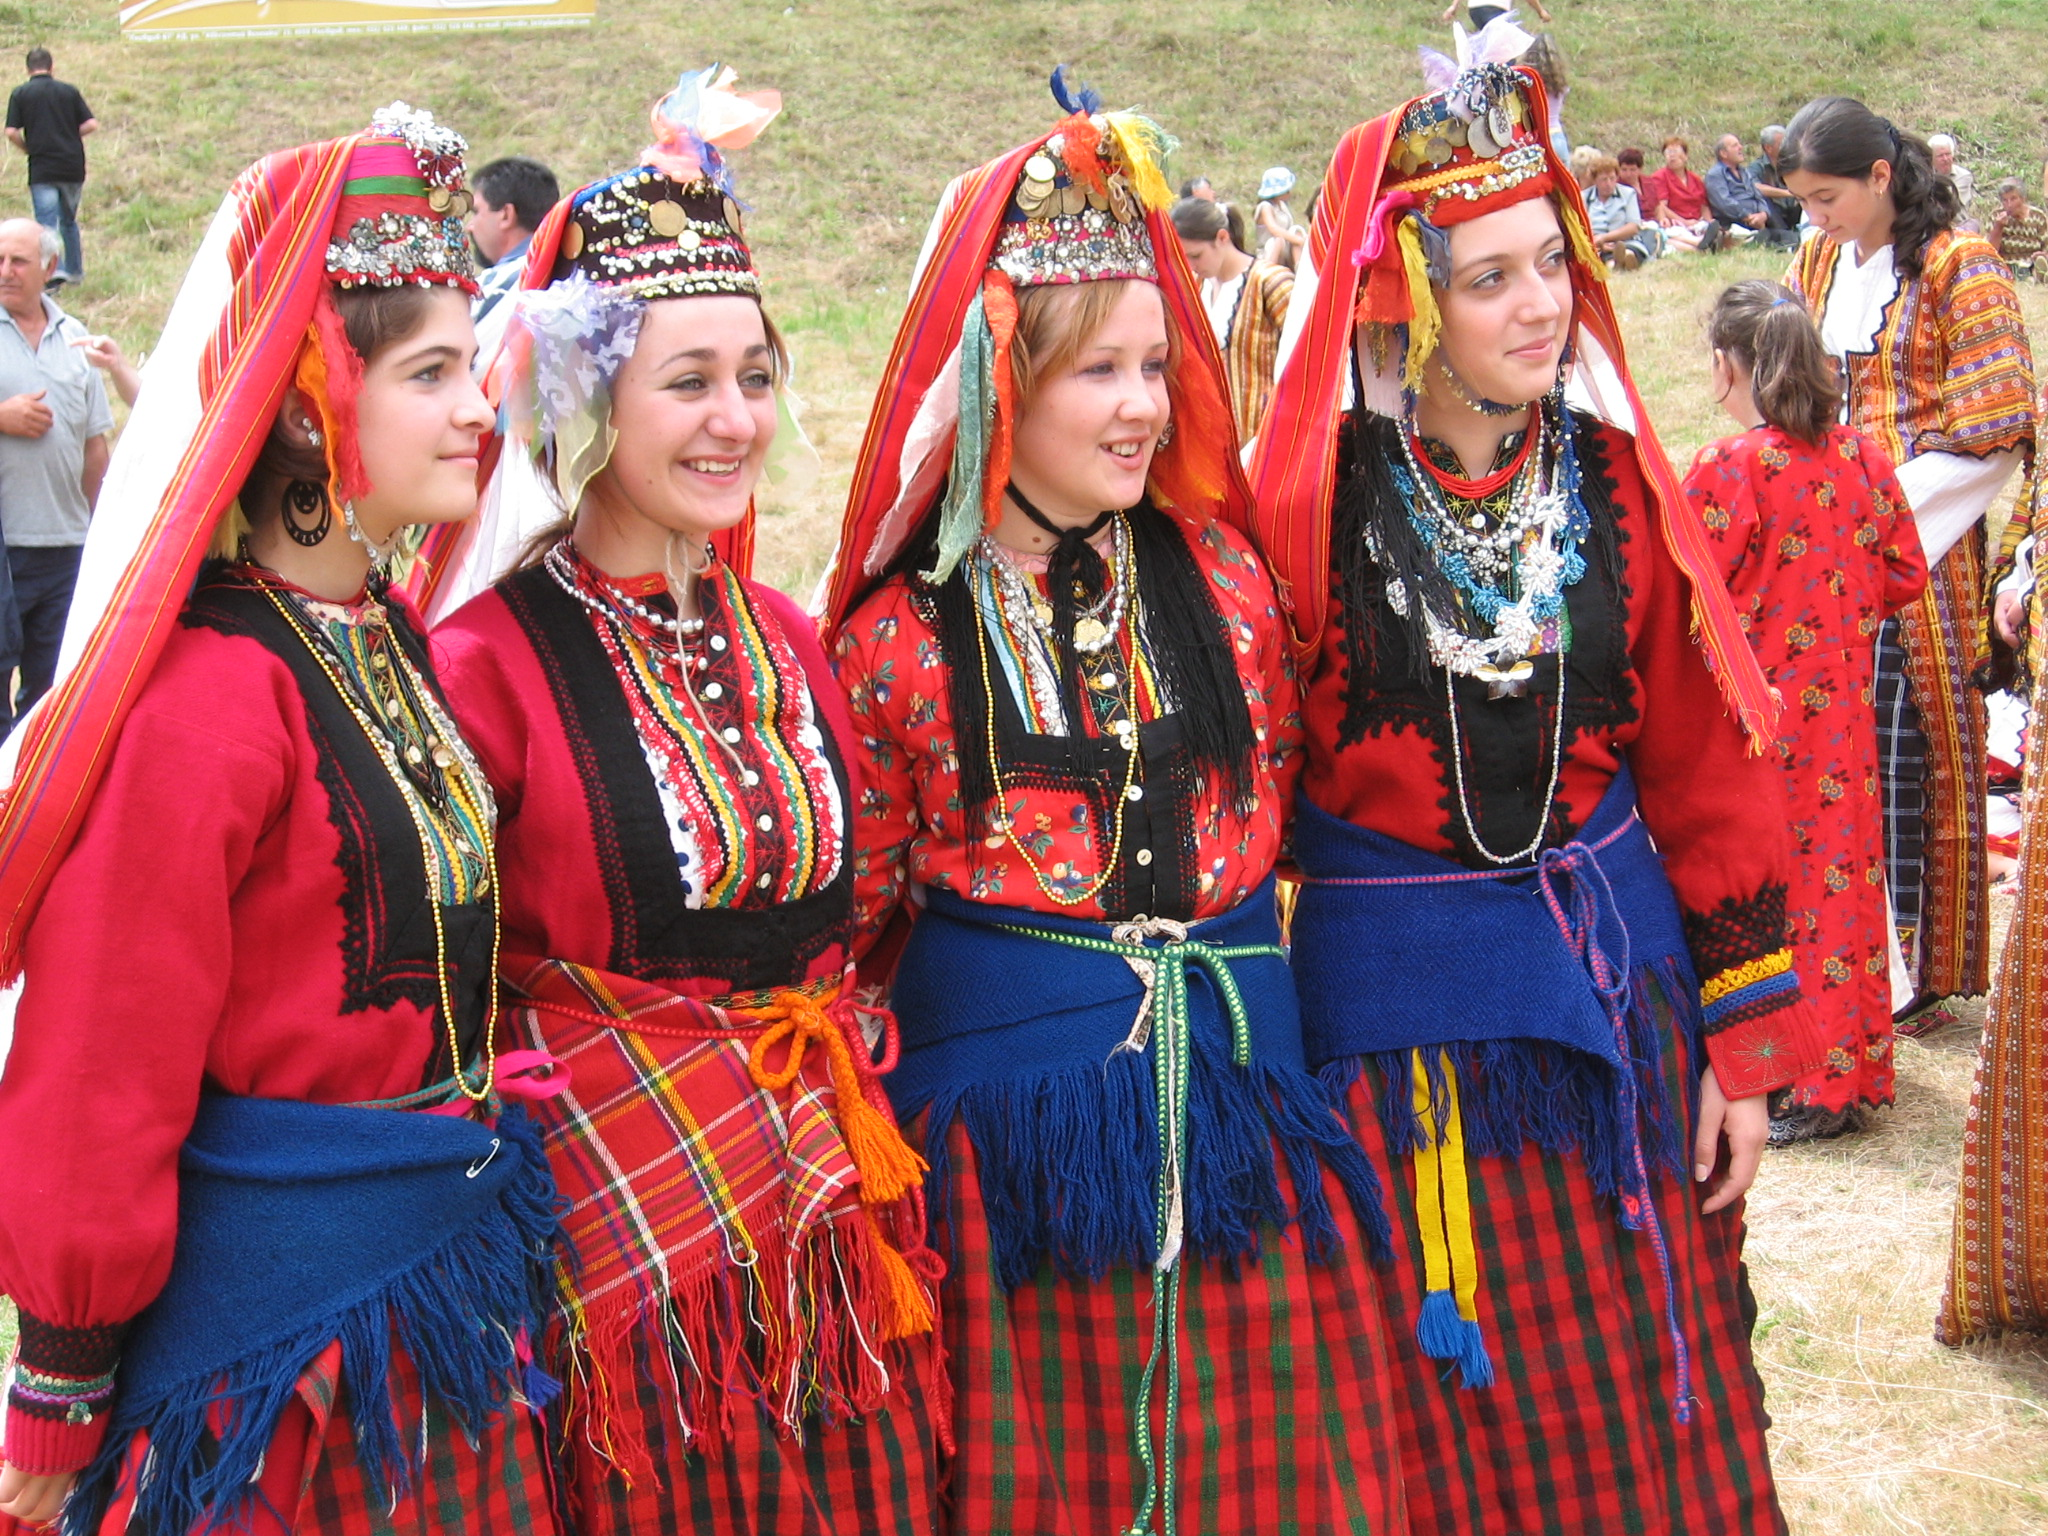 Girls, Bspo06, Colorfull, Culture, Folklore, HQ Photo